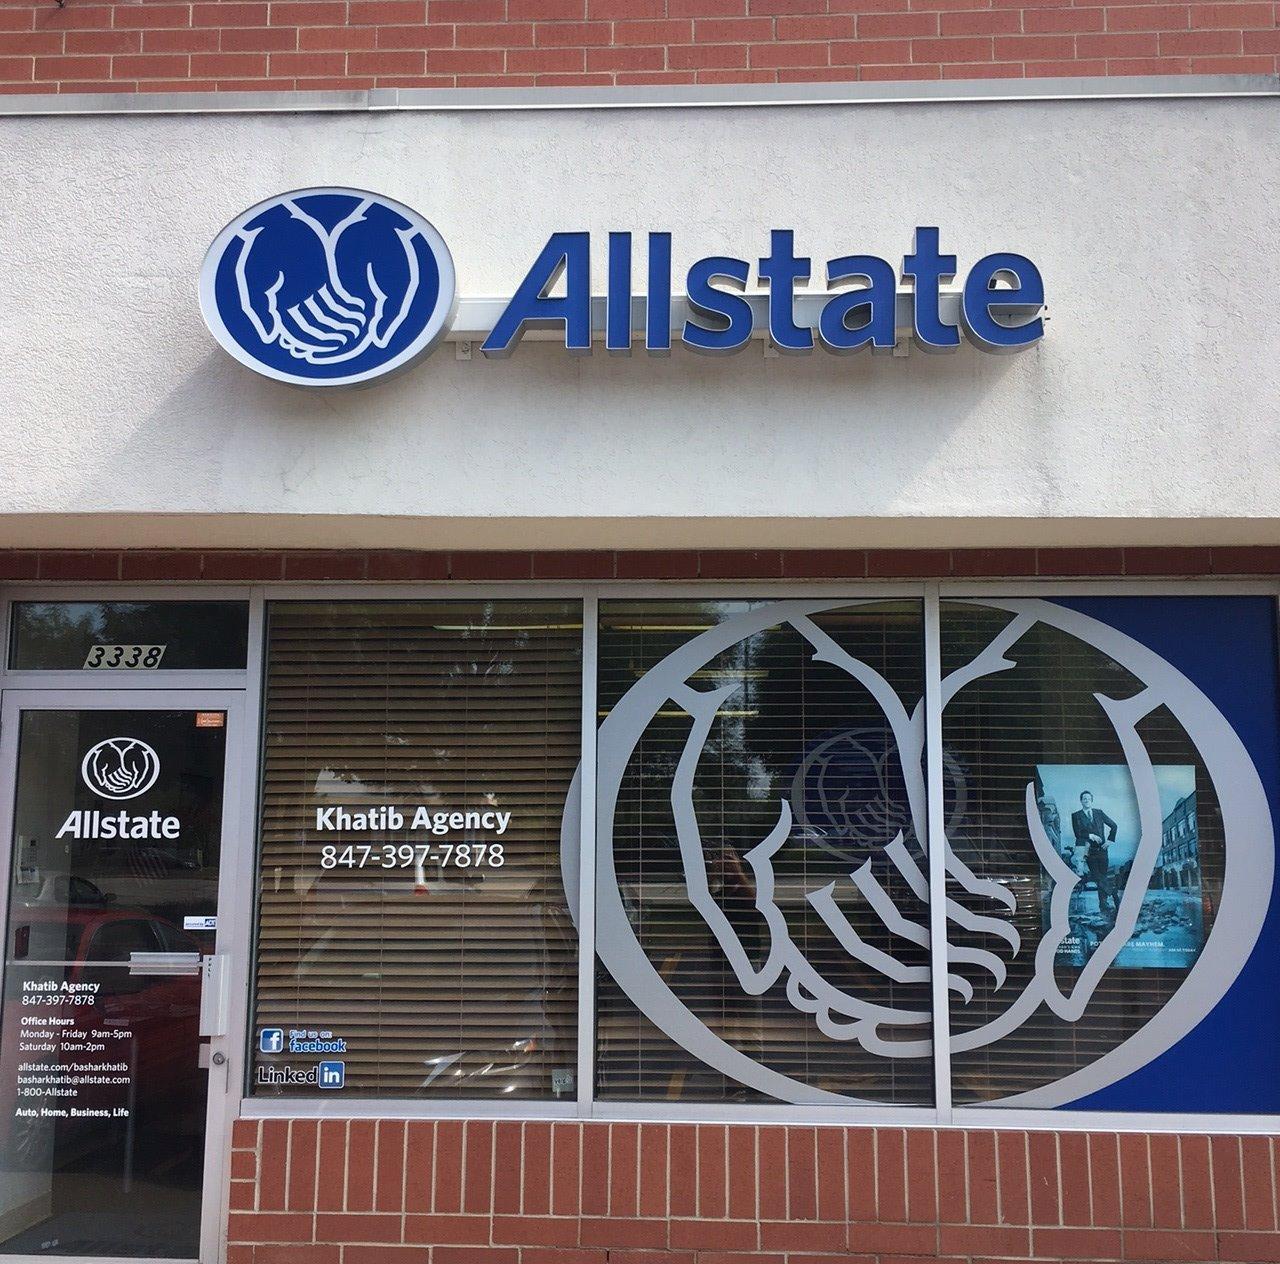 Bashar Khatib: Allstate Insurance image 1